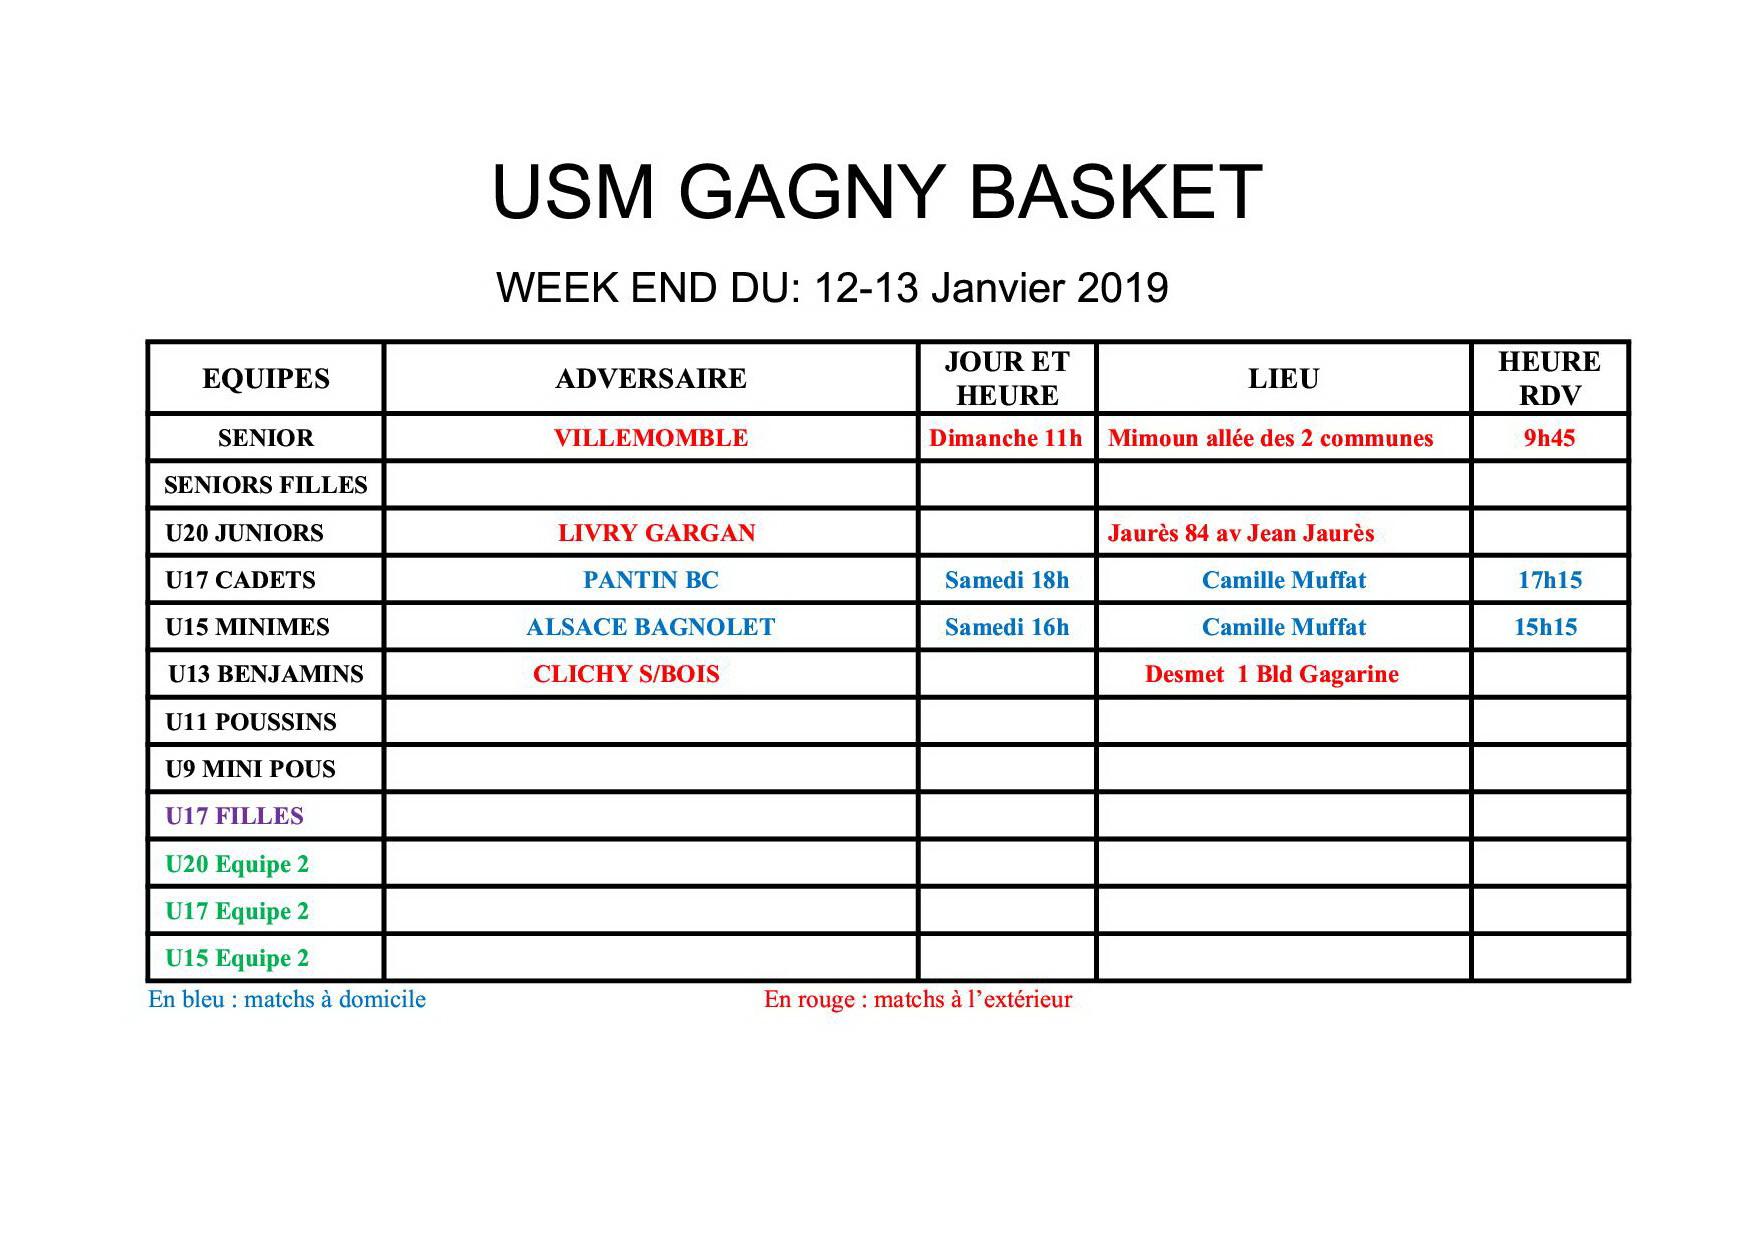 Usmg gagny planning week end 12 13 janvier 2019